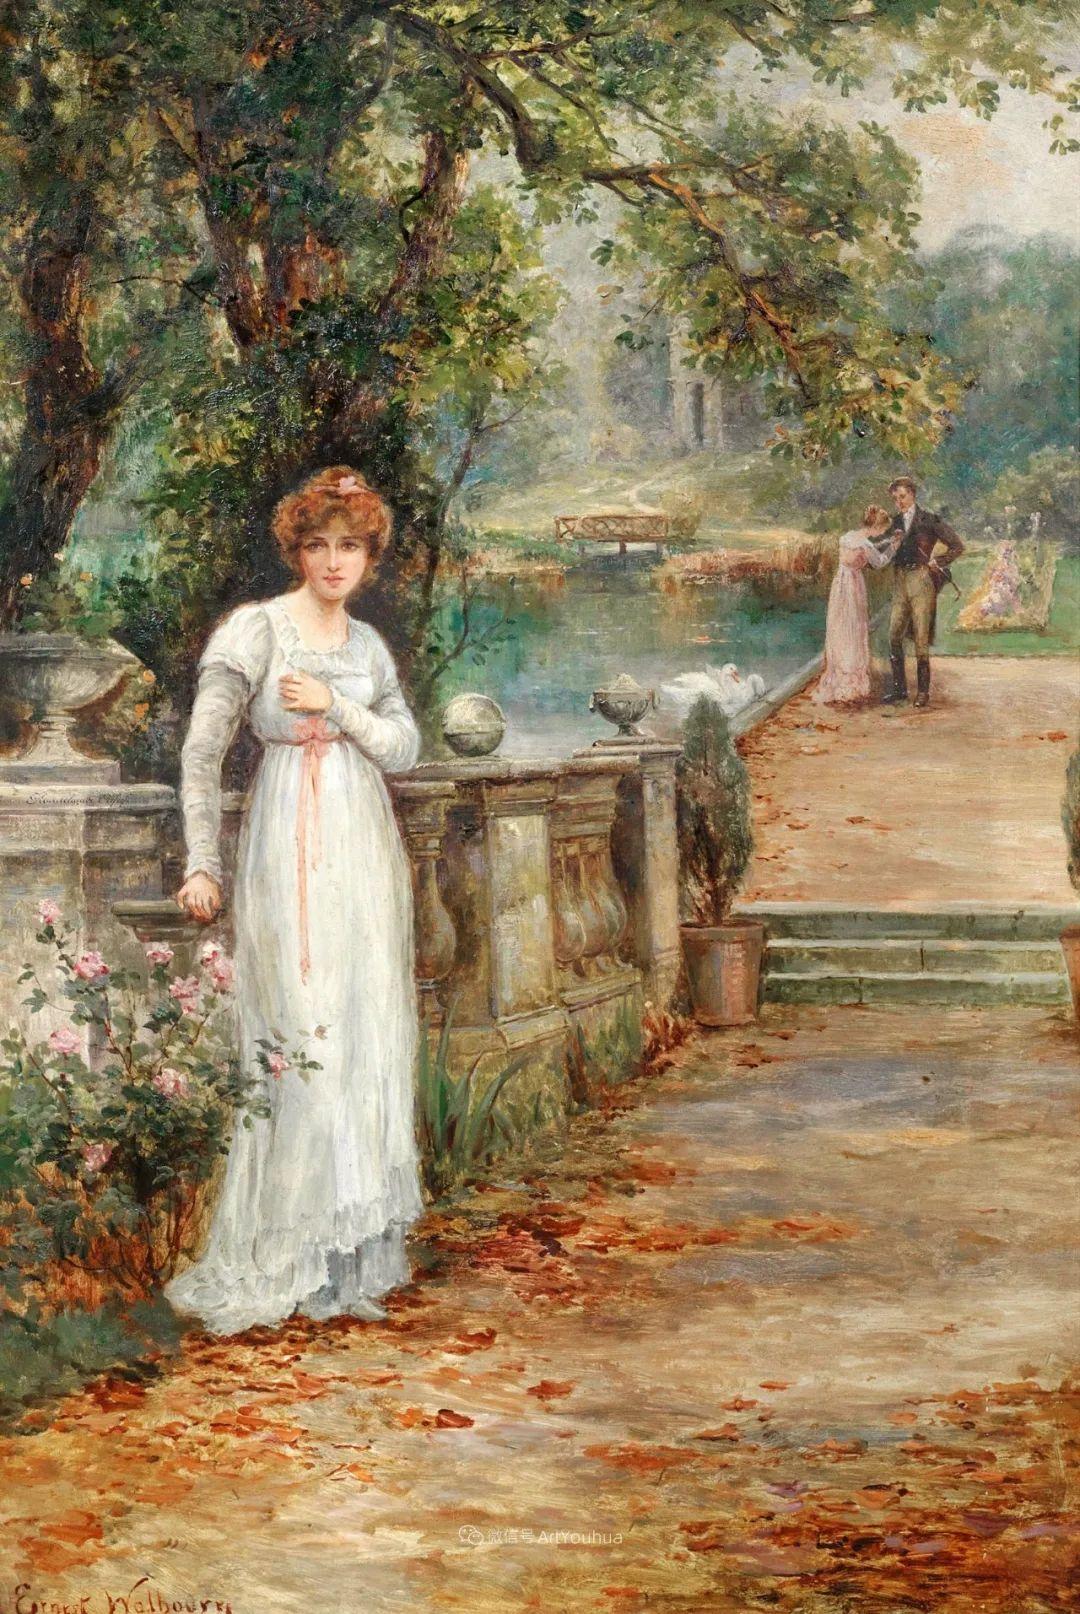 美丽村姑与诗意田园,英国画家Ernest Charles Walbourn作品(下)插图19